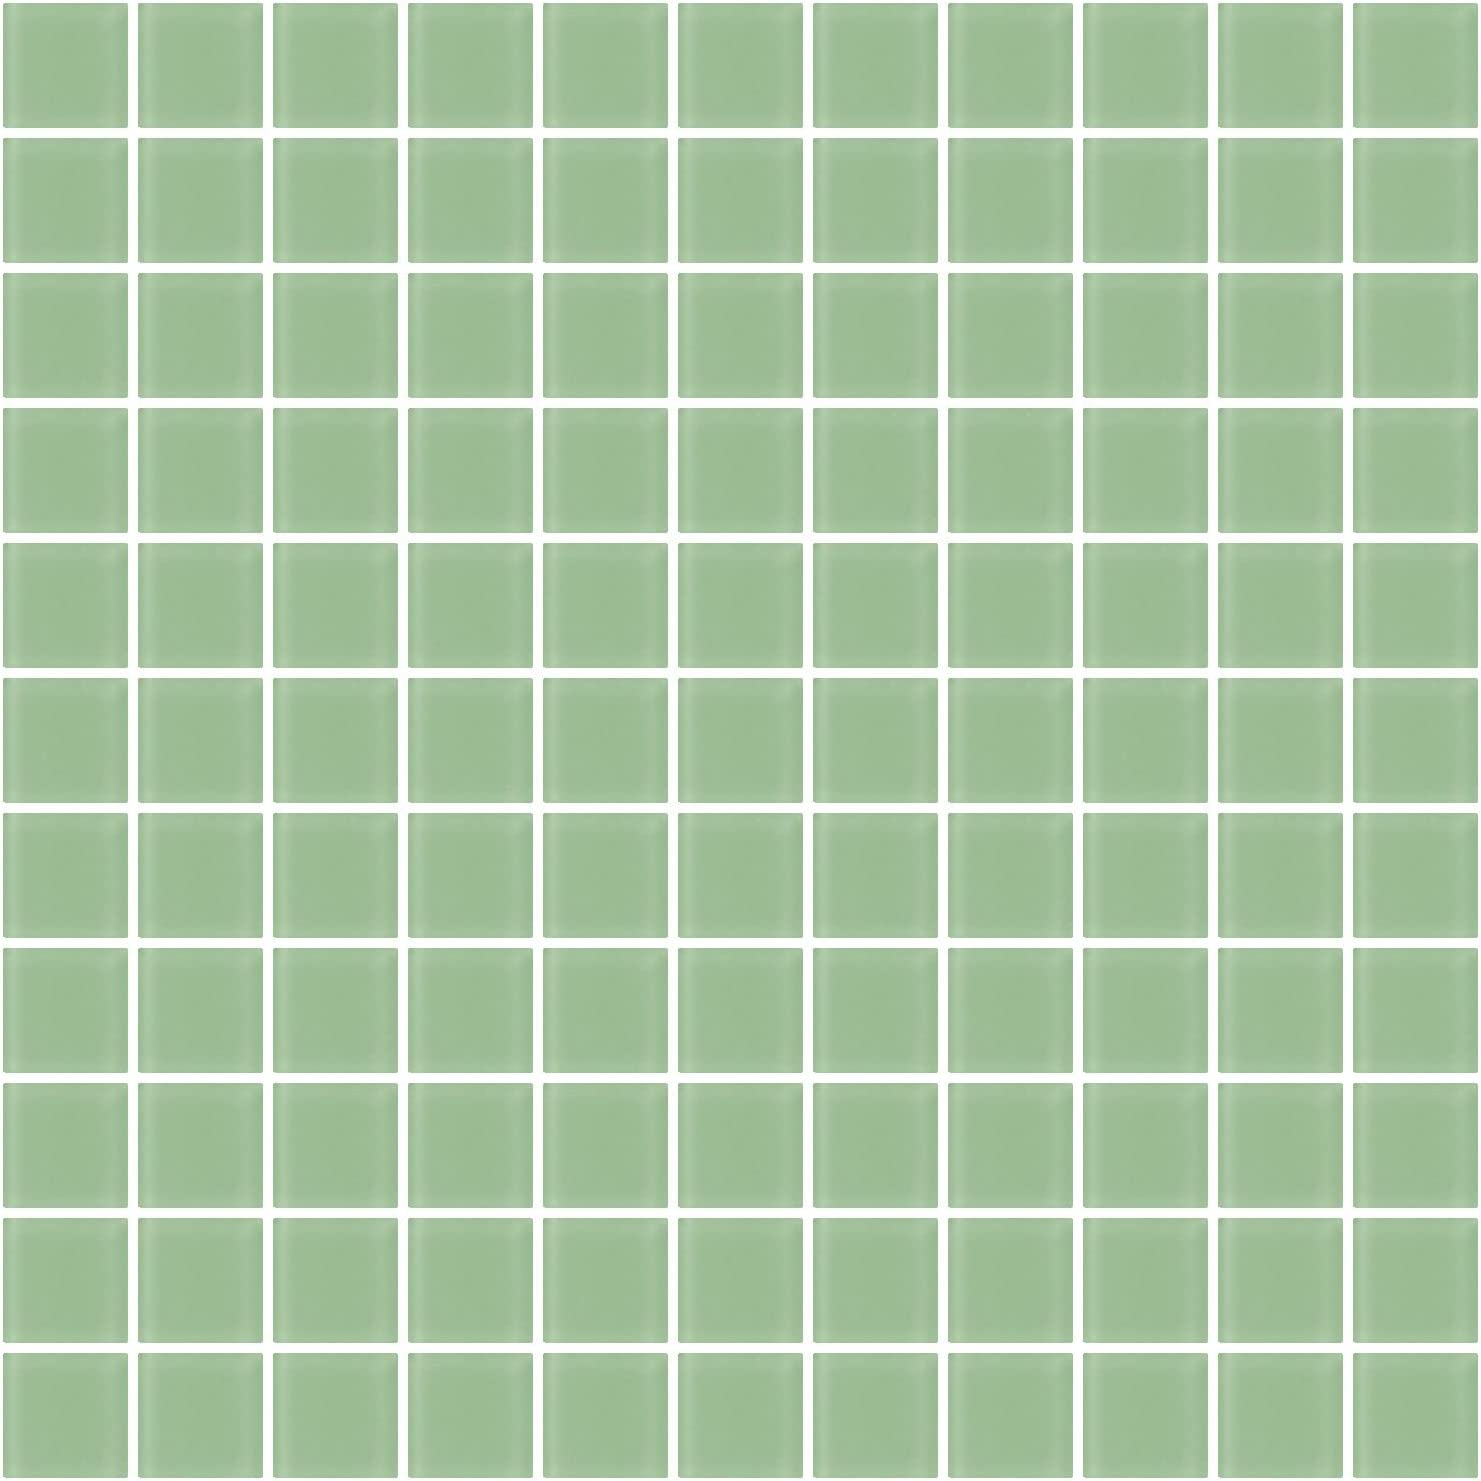 1 Inch Opaque Teal Green Glass Tile Susan Jablon Mosaics